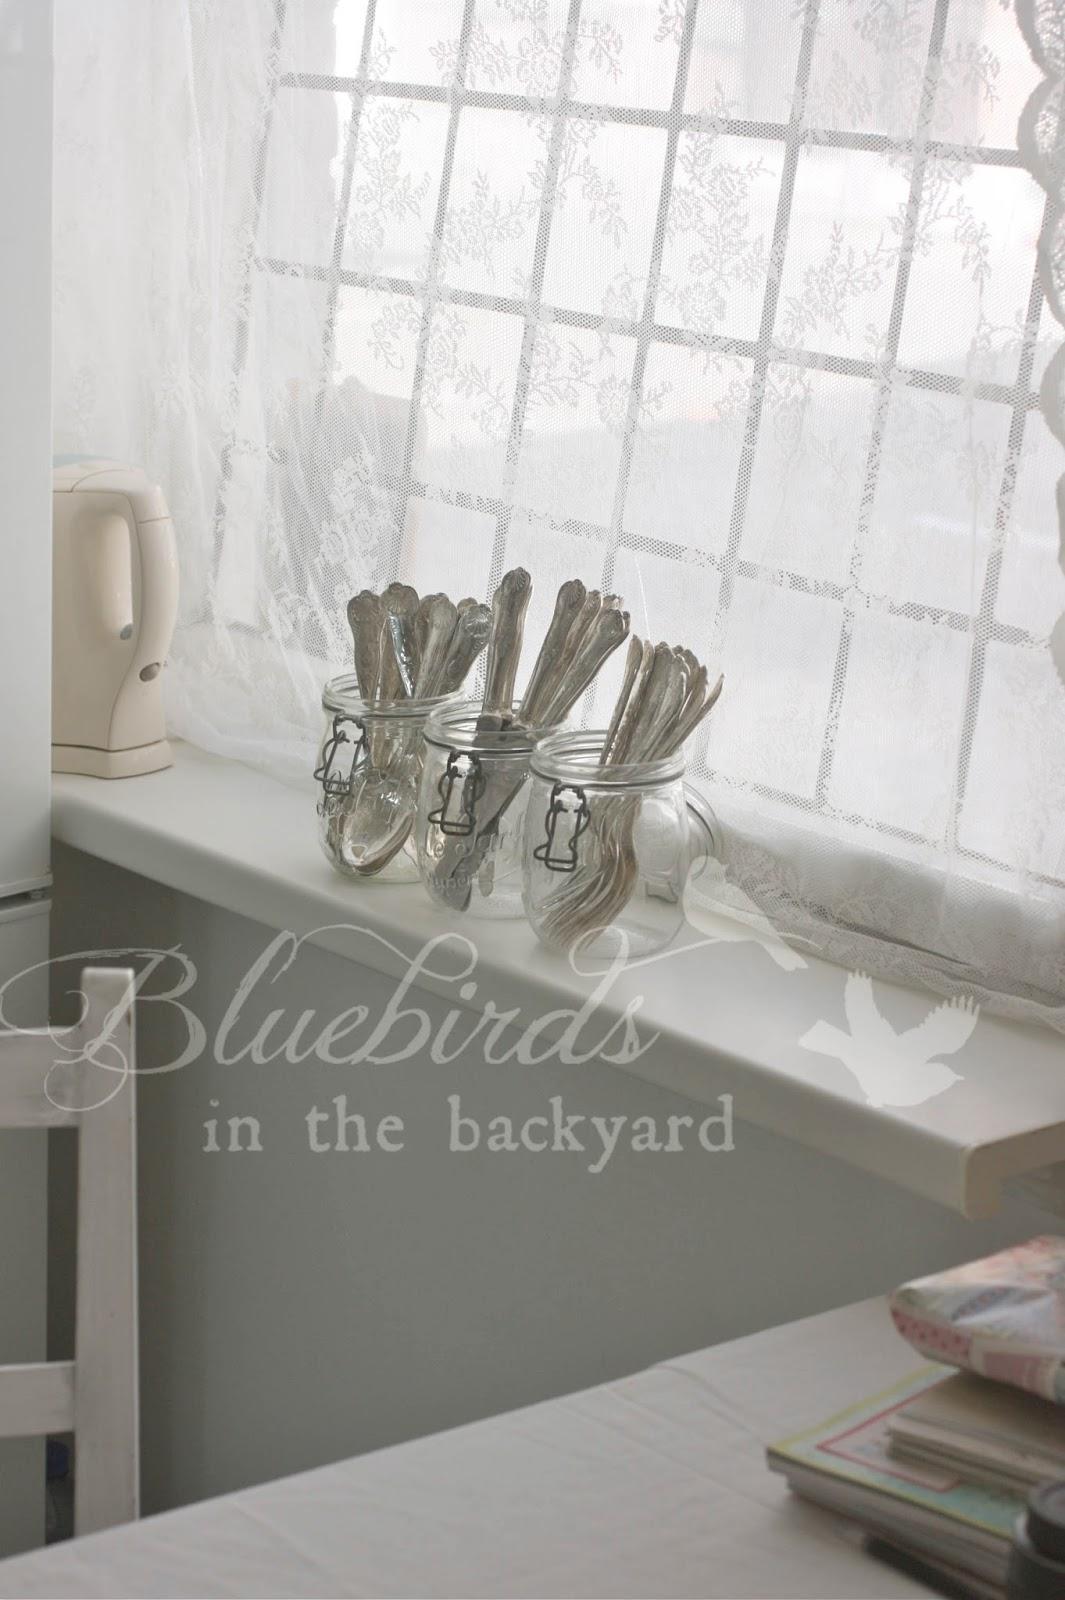 Bluebirds in the backyard: kitchen in retro pastel